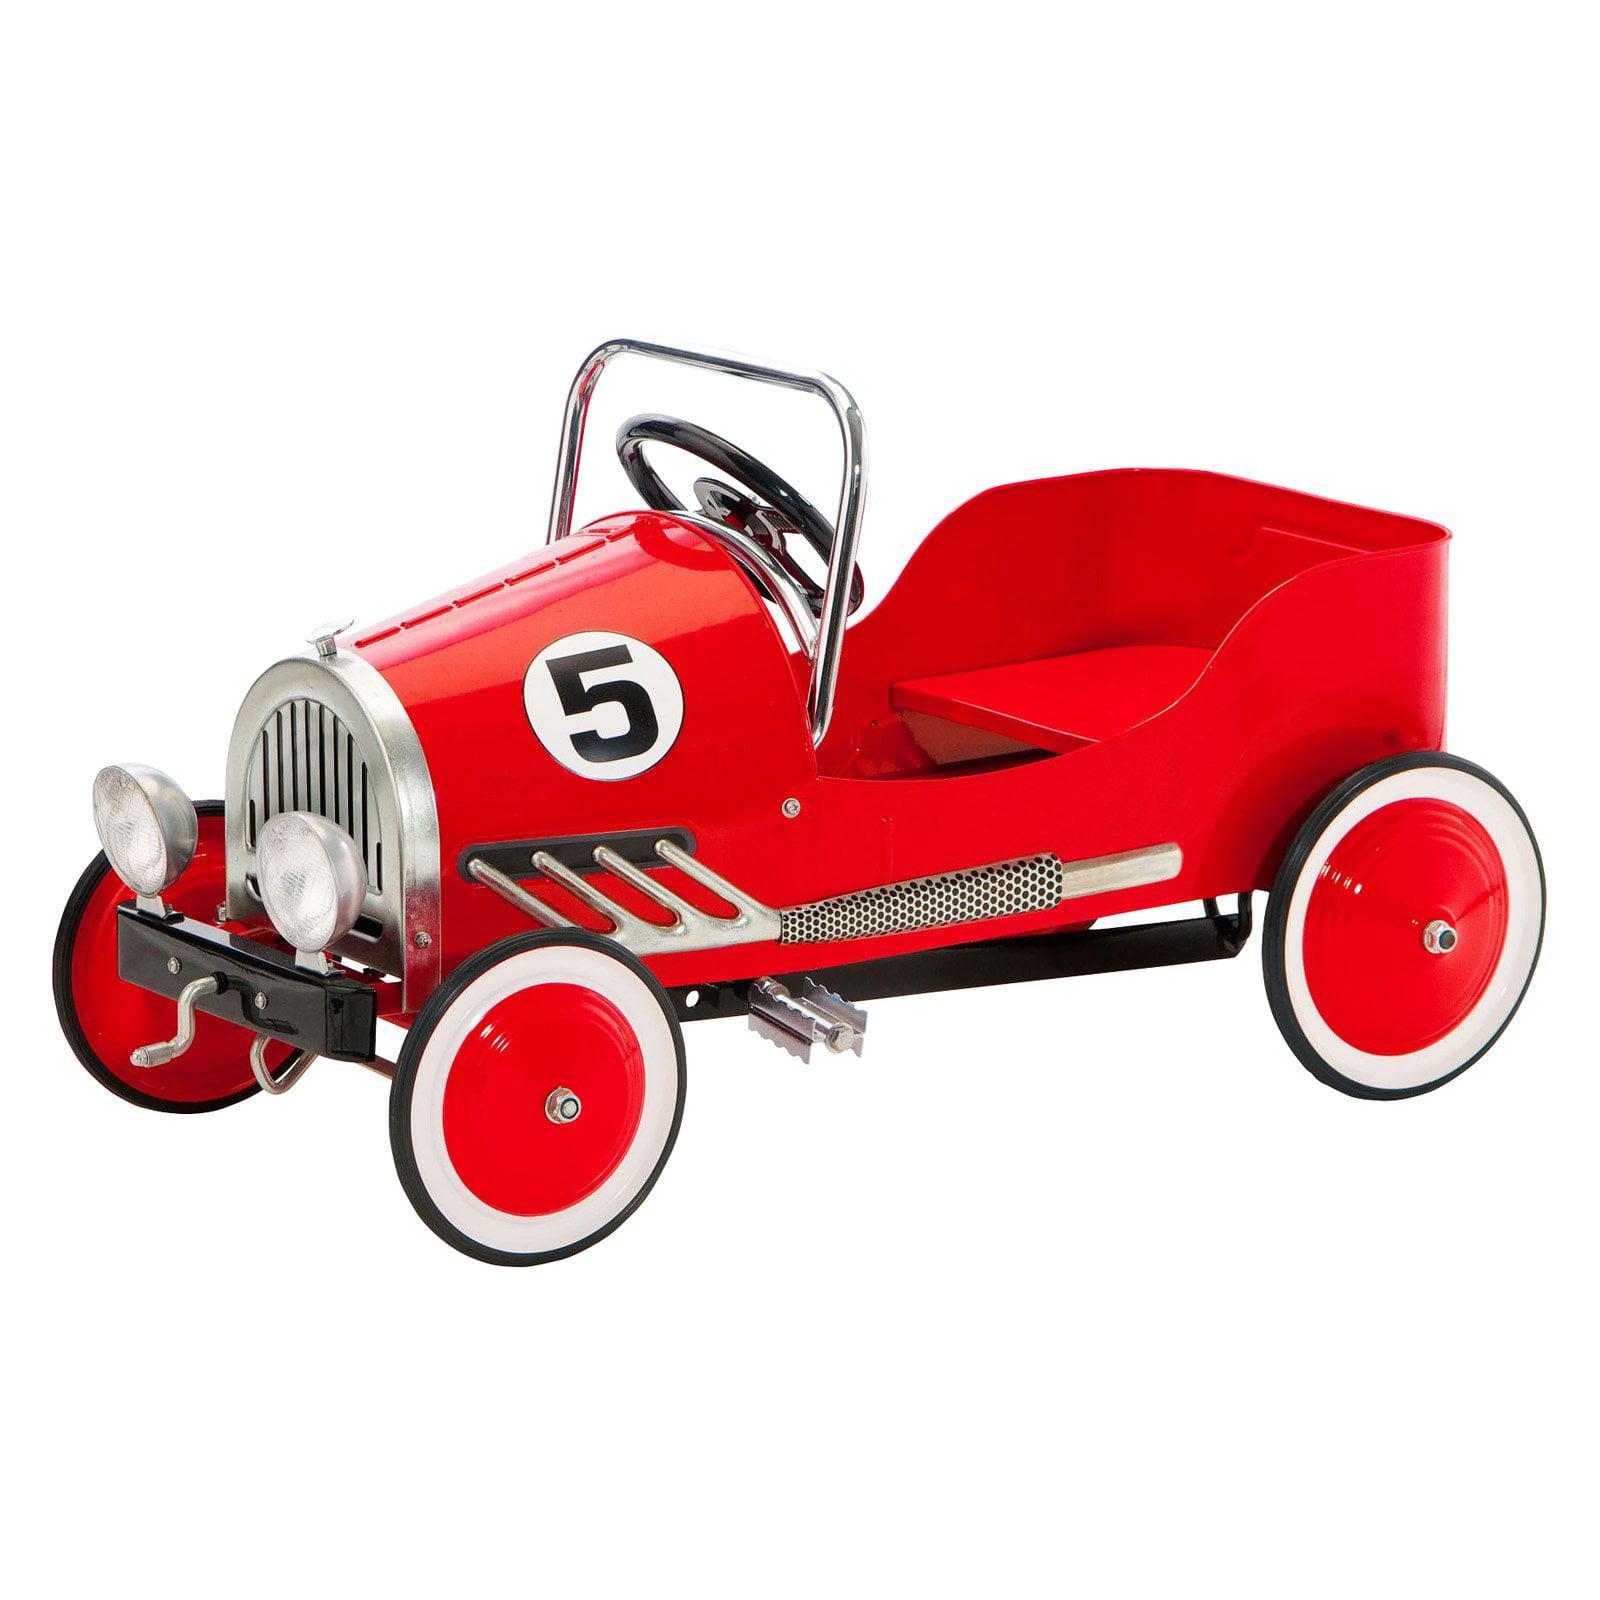 Morgan Cycle Vintage Retro Pedal Car Riding Toy Red by Morgan Cycle